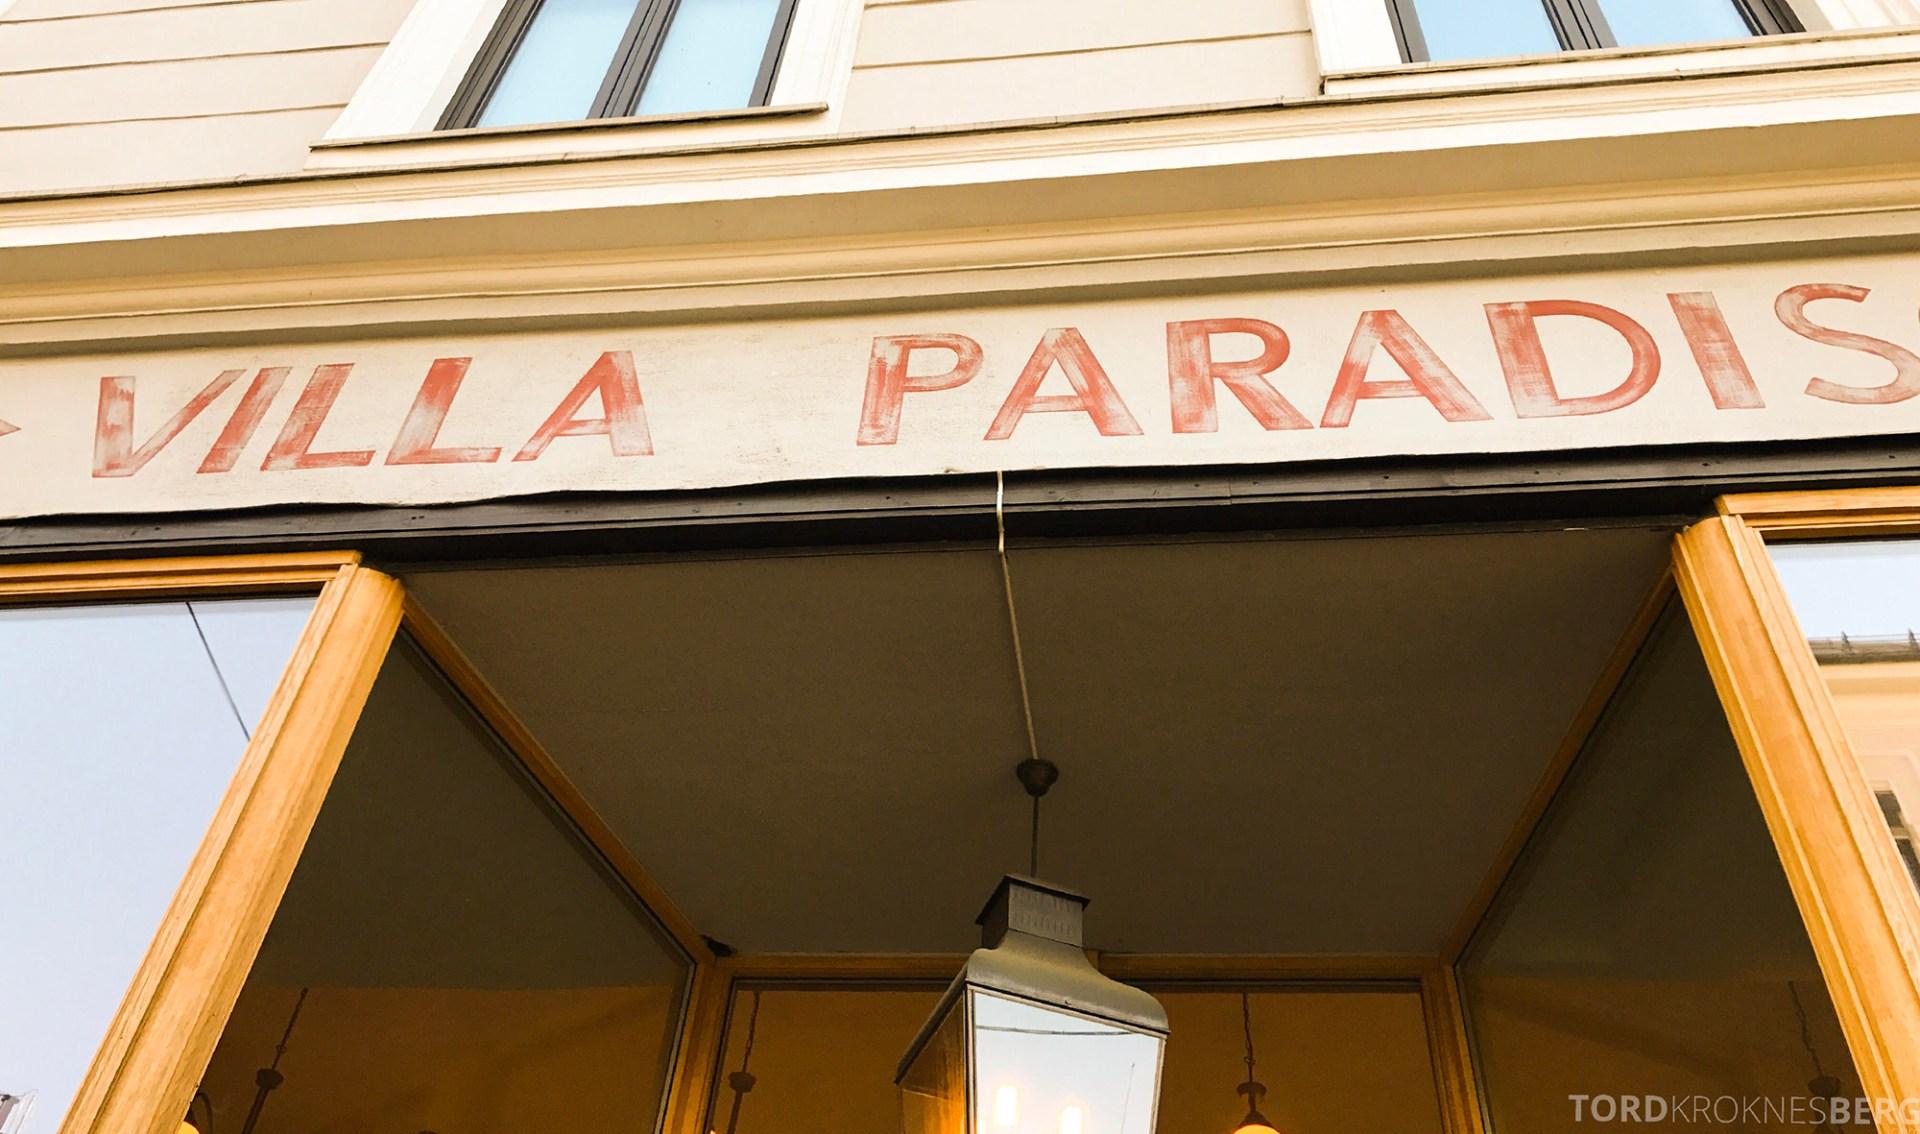 Villa Paradiso Frogner fasade